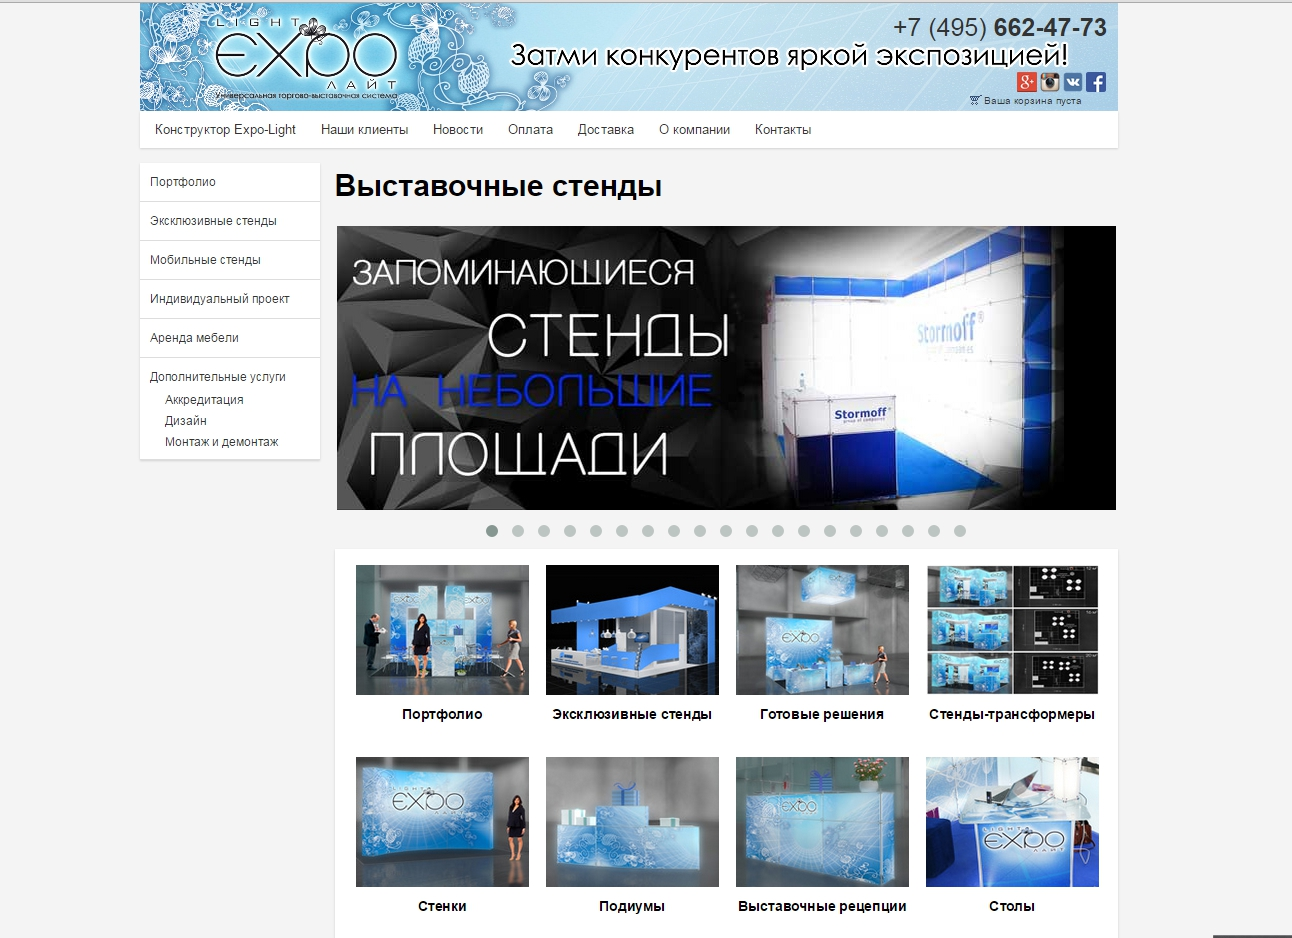 Доработка функционала сайта Expo-light.ru